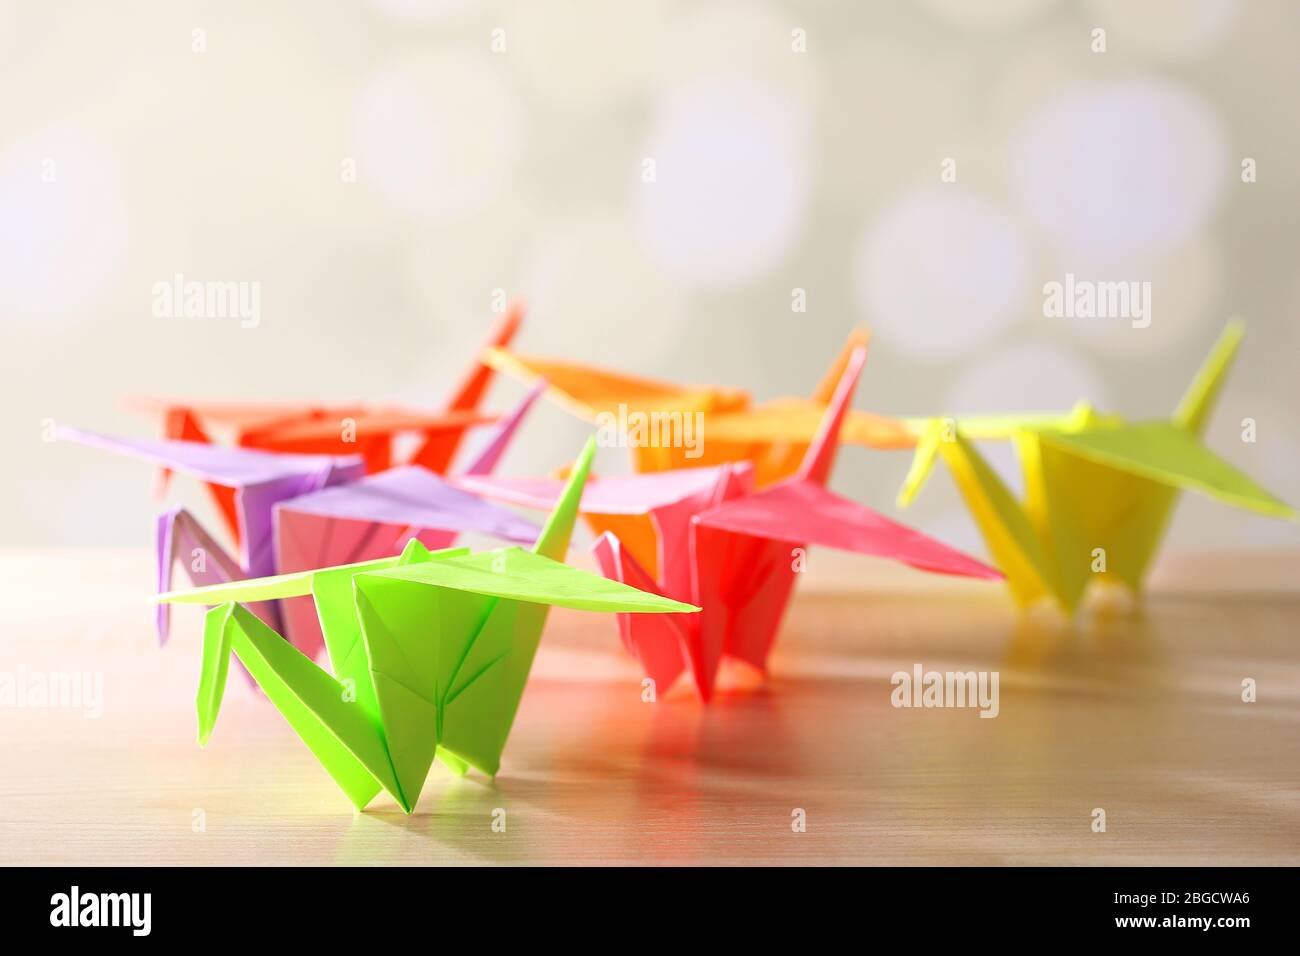 Origami Crane Instructions   956x1300